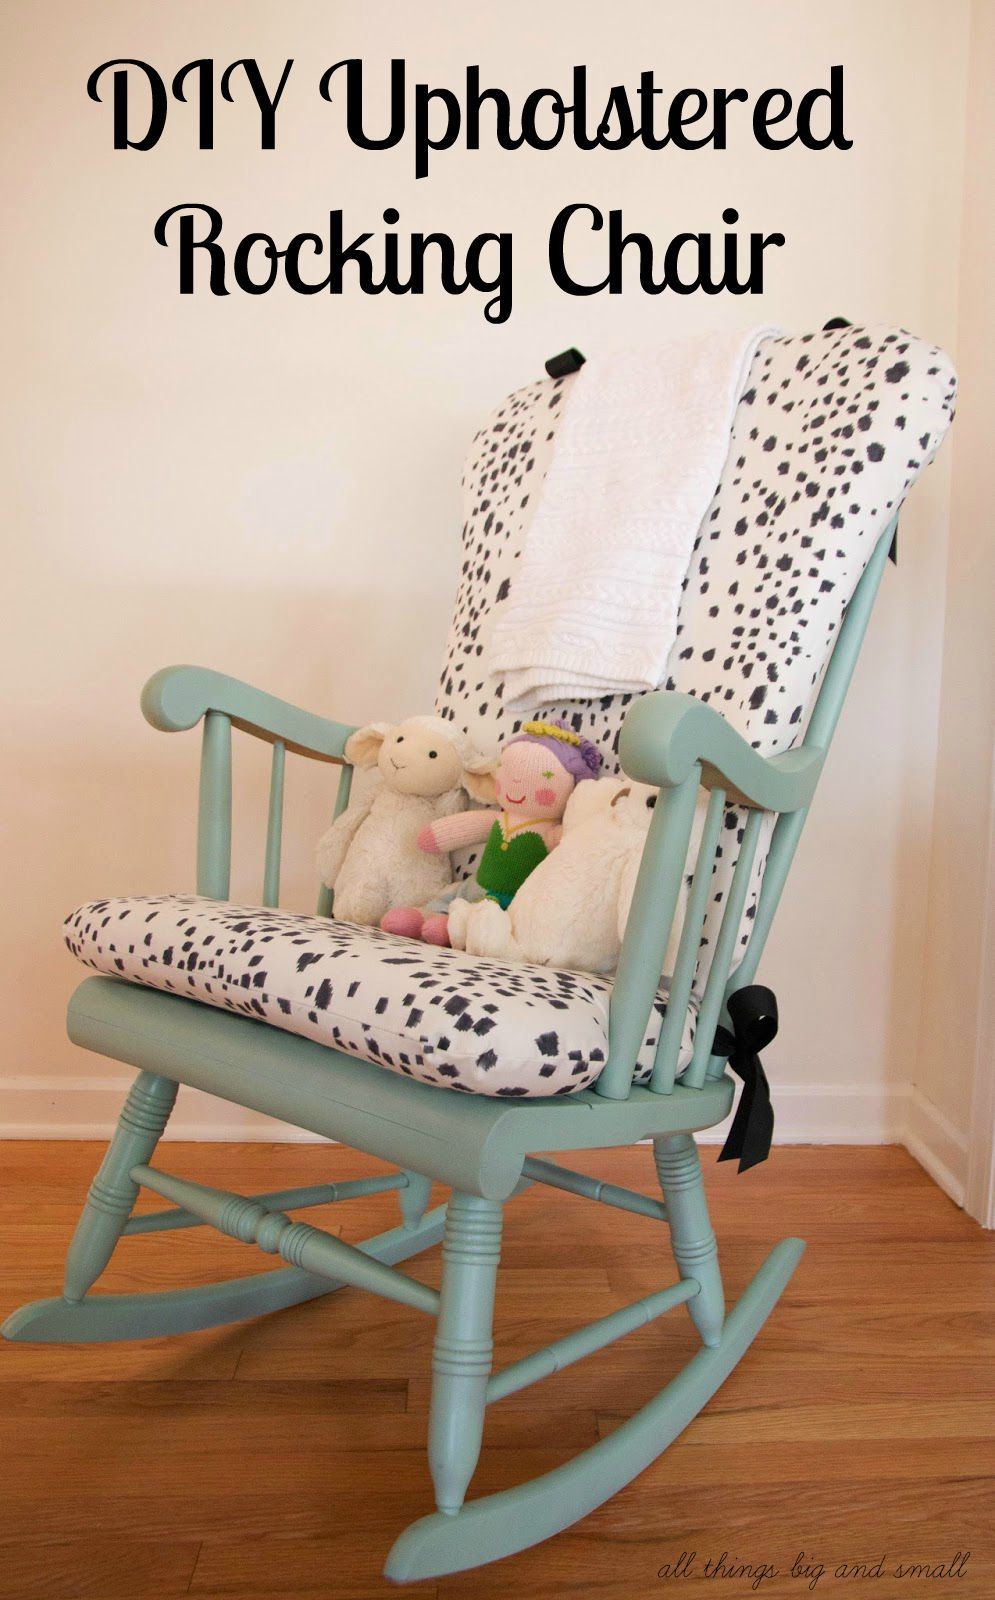 DIY Upholstered Rocking Chair | Home Decor | DIY Decor Mom